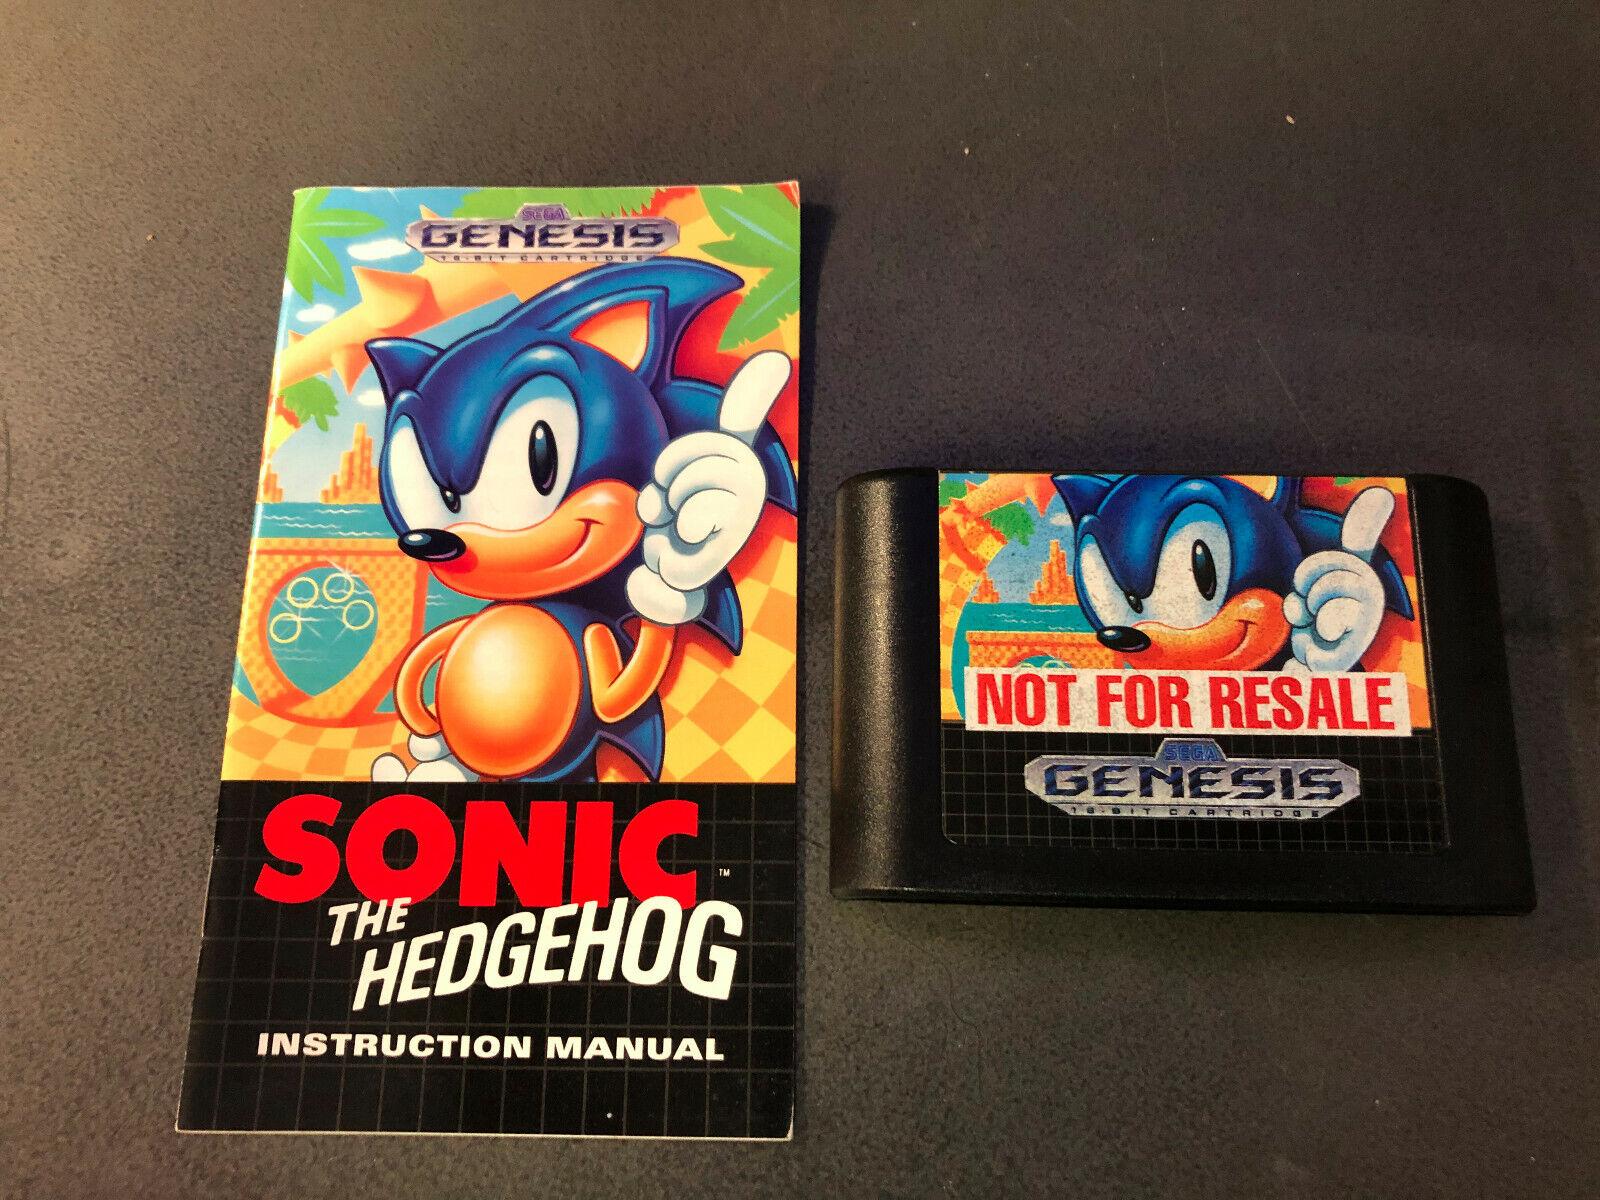 Sonic The Hedgehog Sega Genesis, 1991 W/ Manual Not For Resale Authentic RARE - $7.50